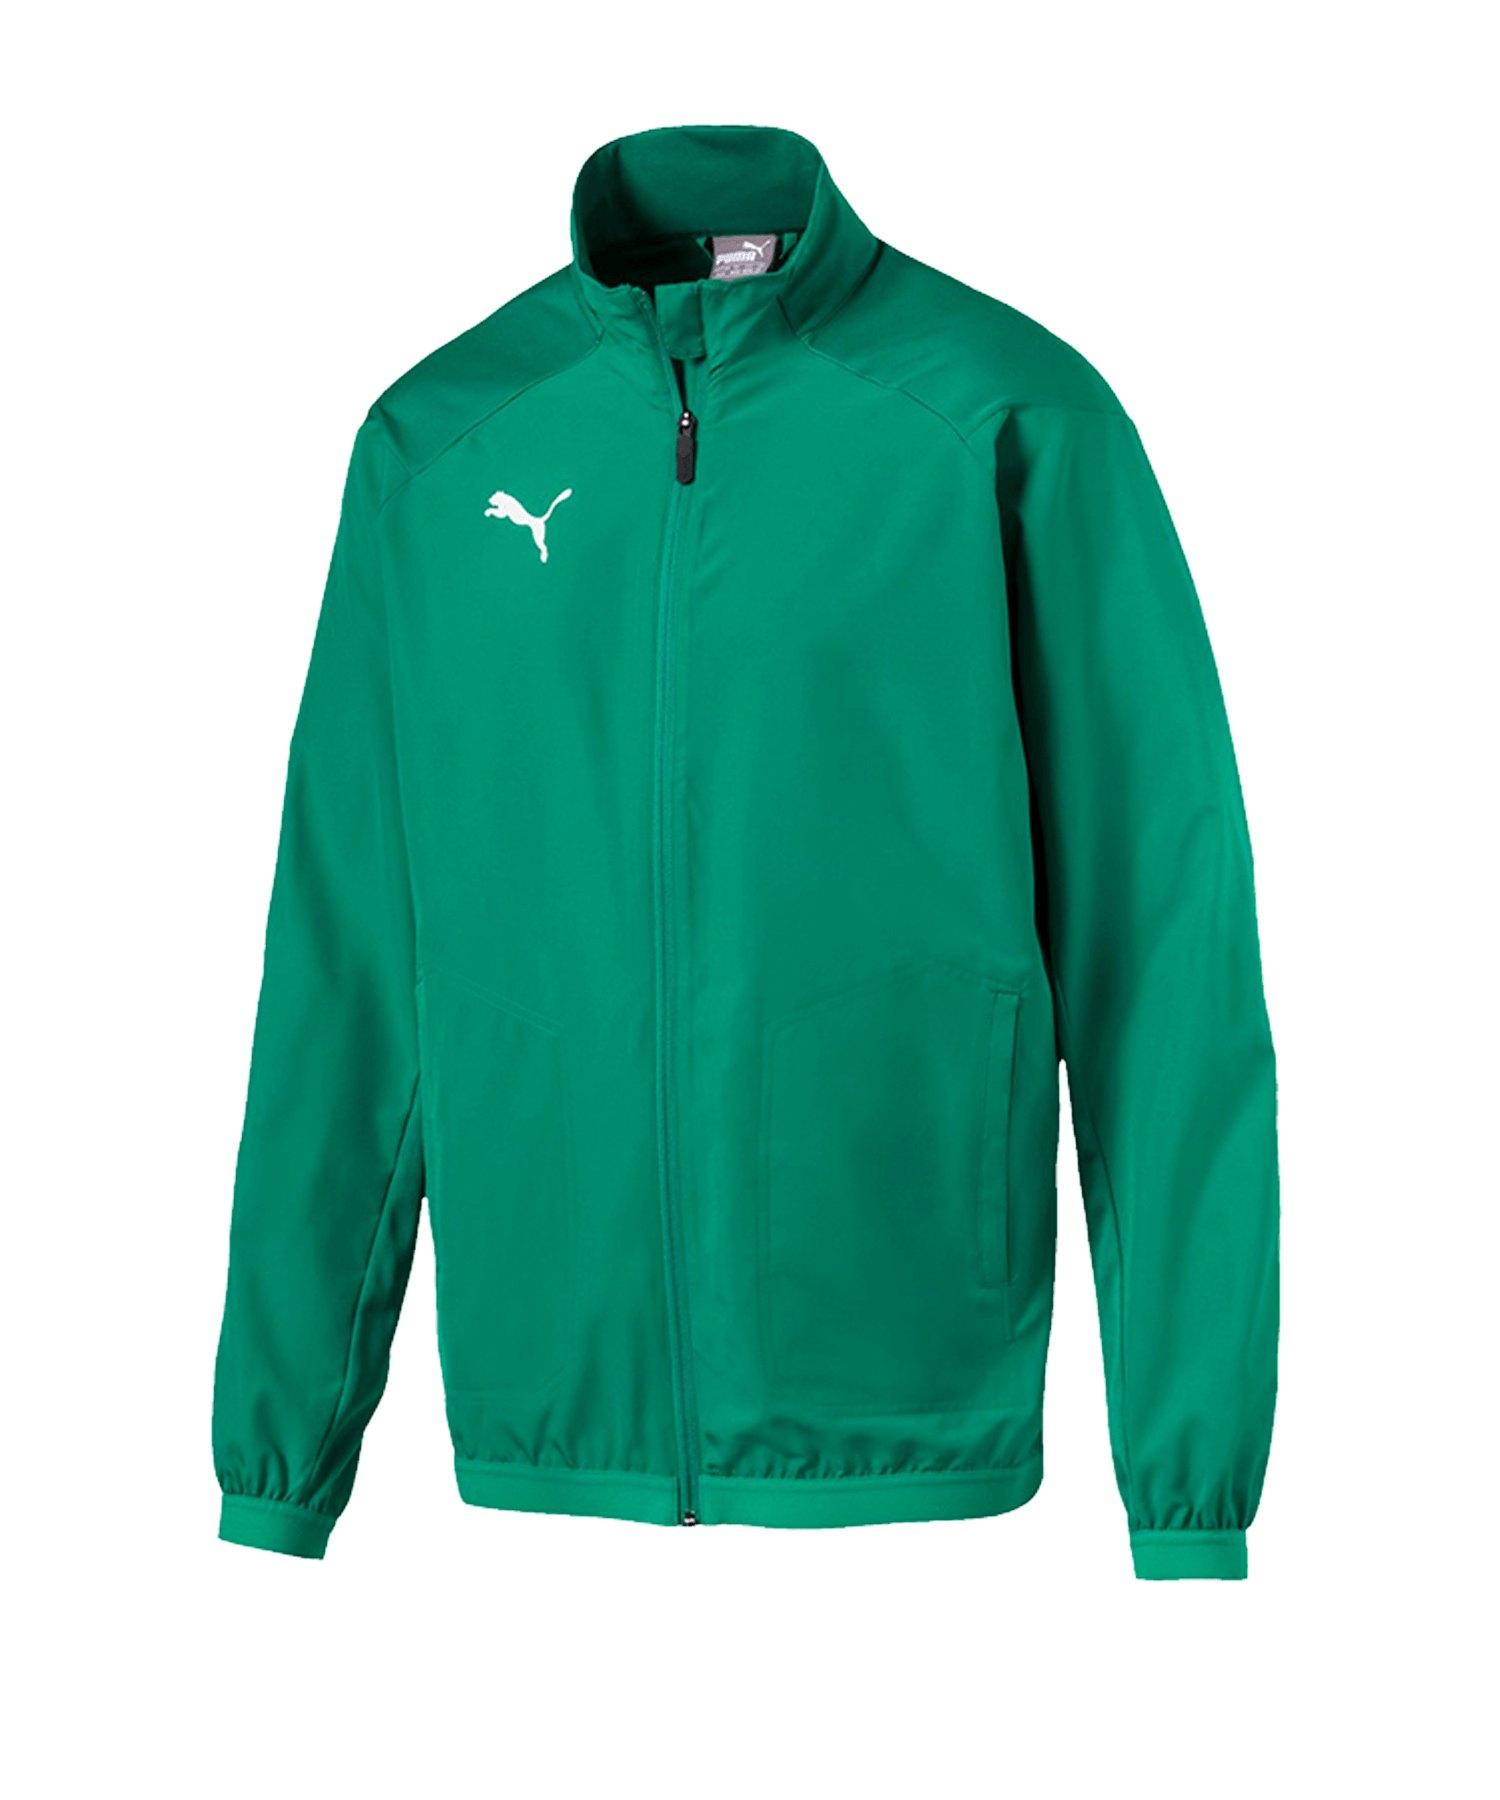 PUMA LIGA Sideline Jacket Jacke Grün Weiss F05 - gruen